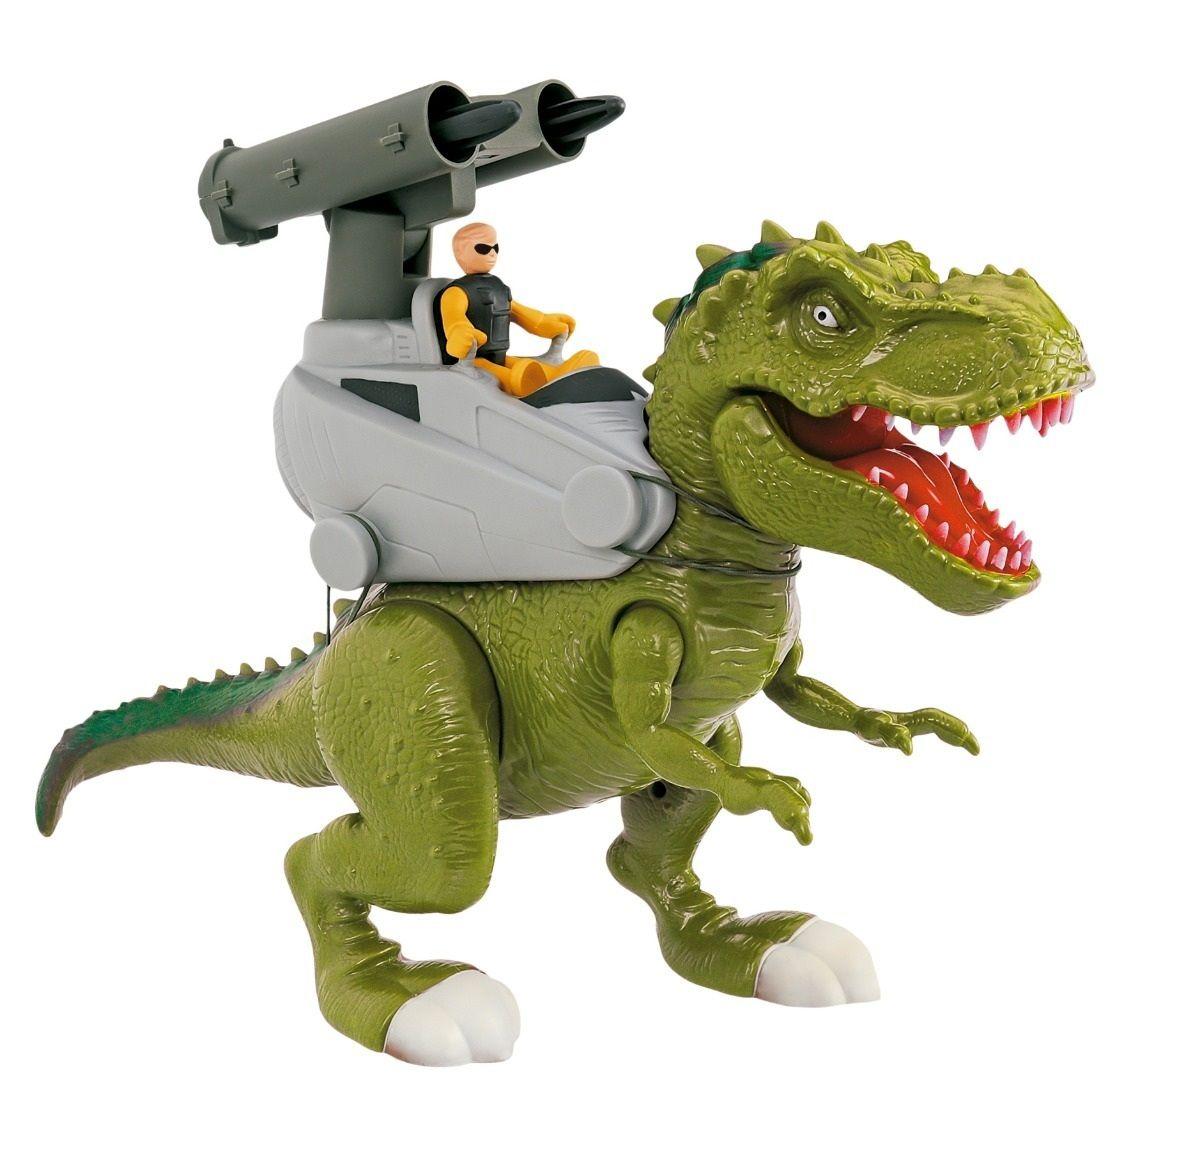 Dinossauro Rex Attack Lança Míssil - Adijomar - Loja Brinquedos - Há ... ae59f8b0a5783